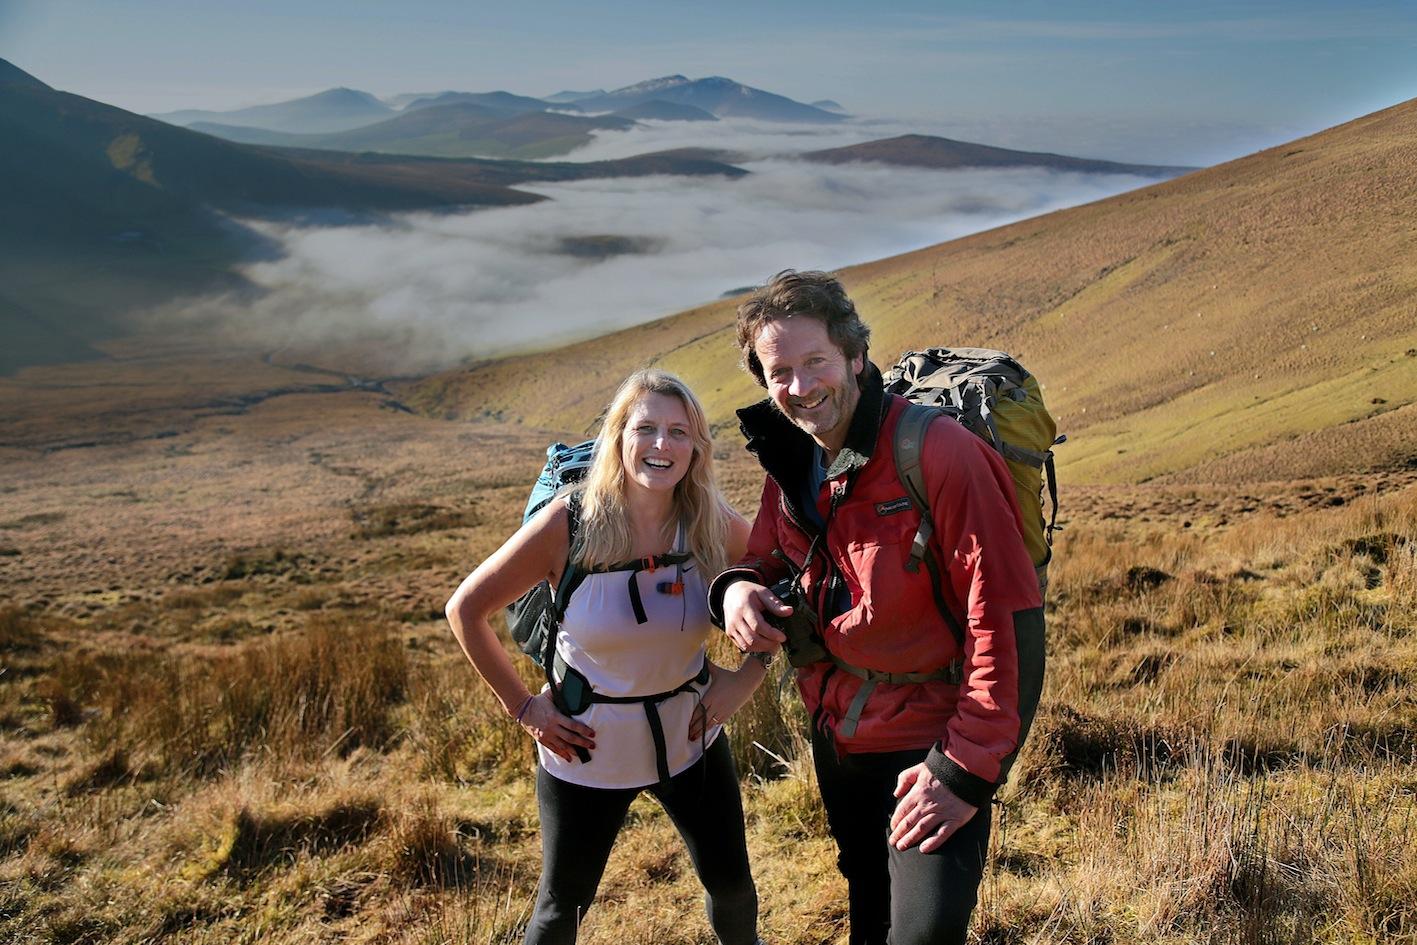 John O'Sullivan, Lodge and Reeks Guiding, with Marie Kehoe-O'Sullivan enjoying a trek on Caherconree Sliabh Mish, Camp. PICTURE: VALERIE O'SULLIVAN